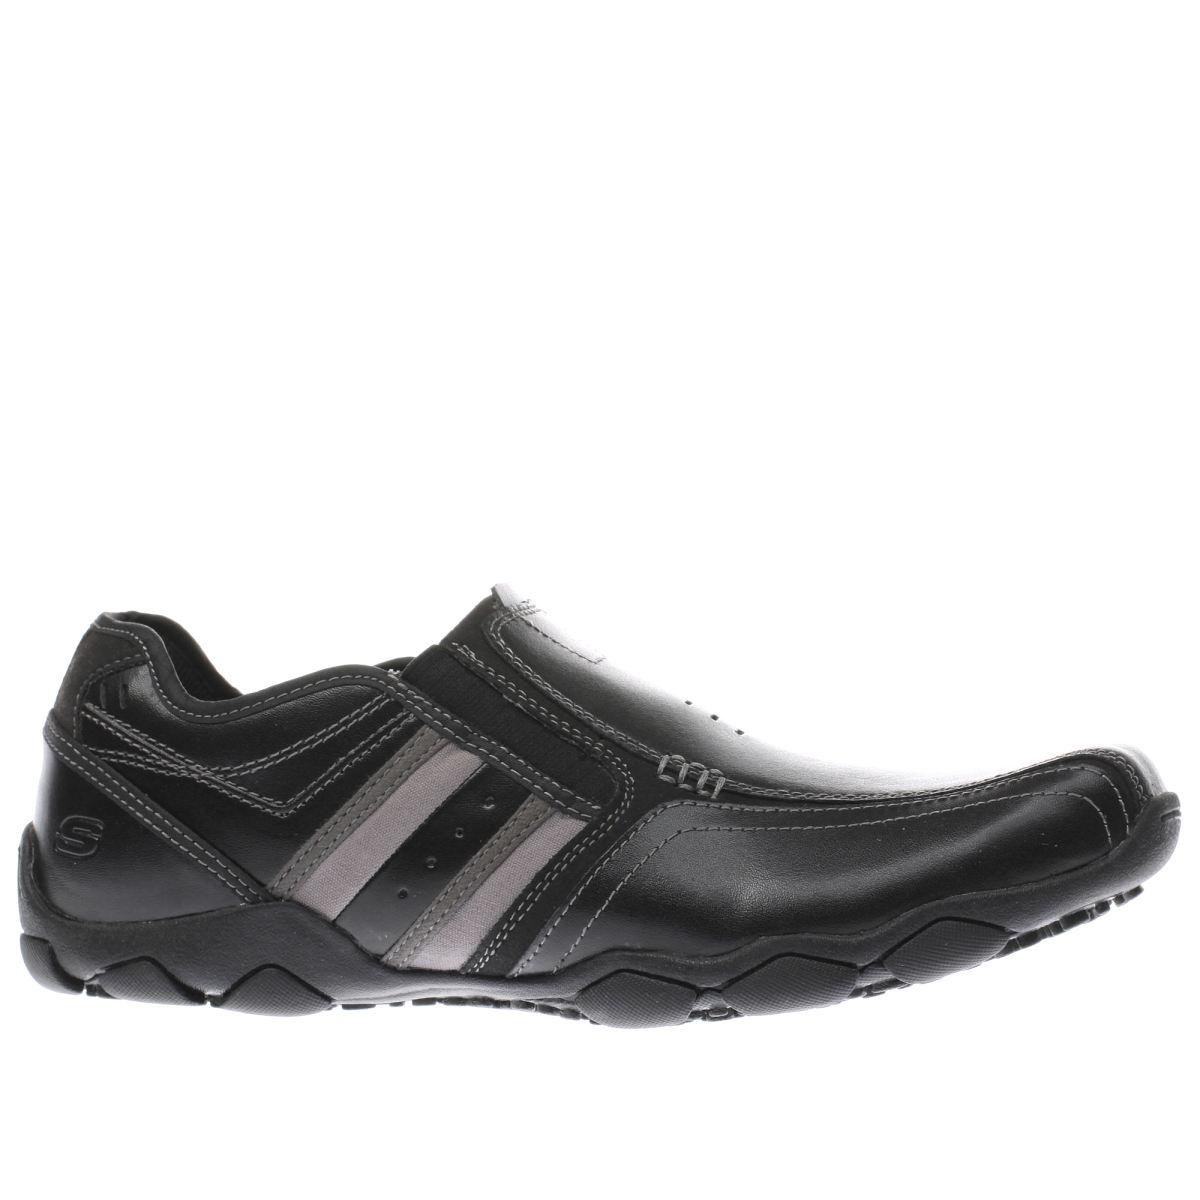 skechers black diameter zimroy shoes